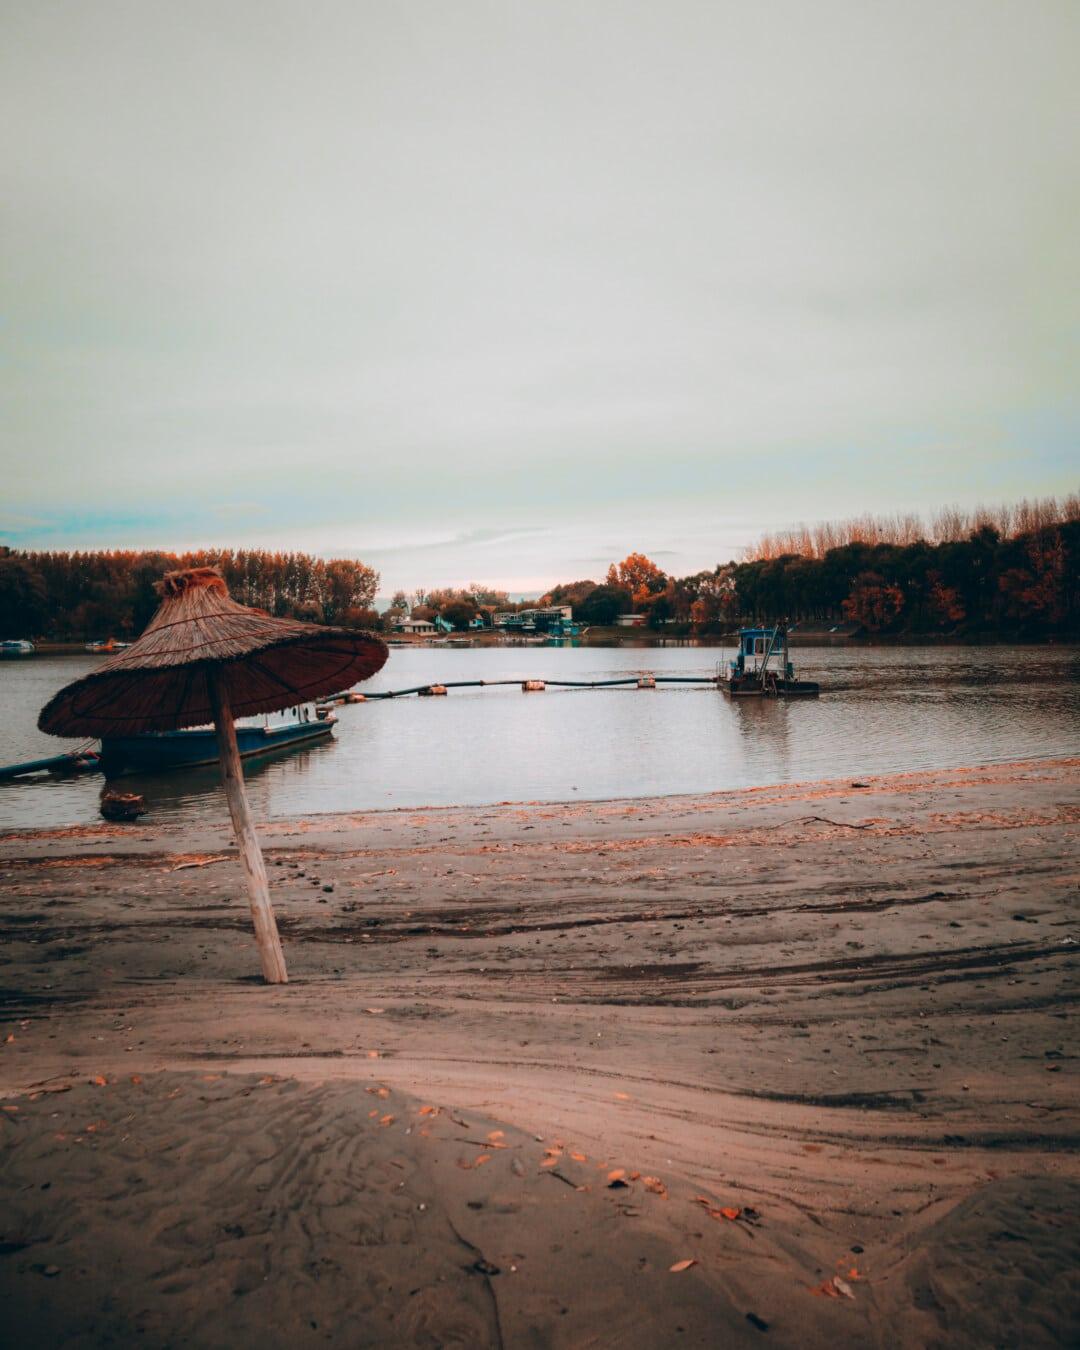 summer season, parasol, beach, ship, water, sunset, dawn, pier, boat, lake